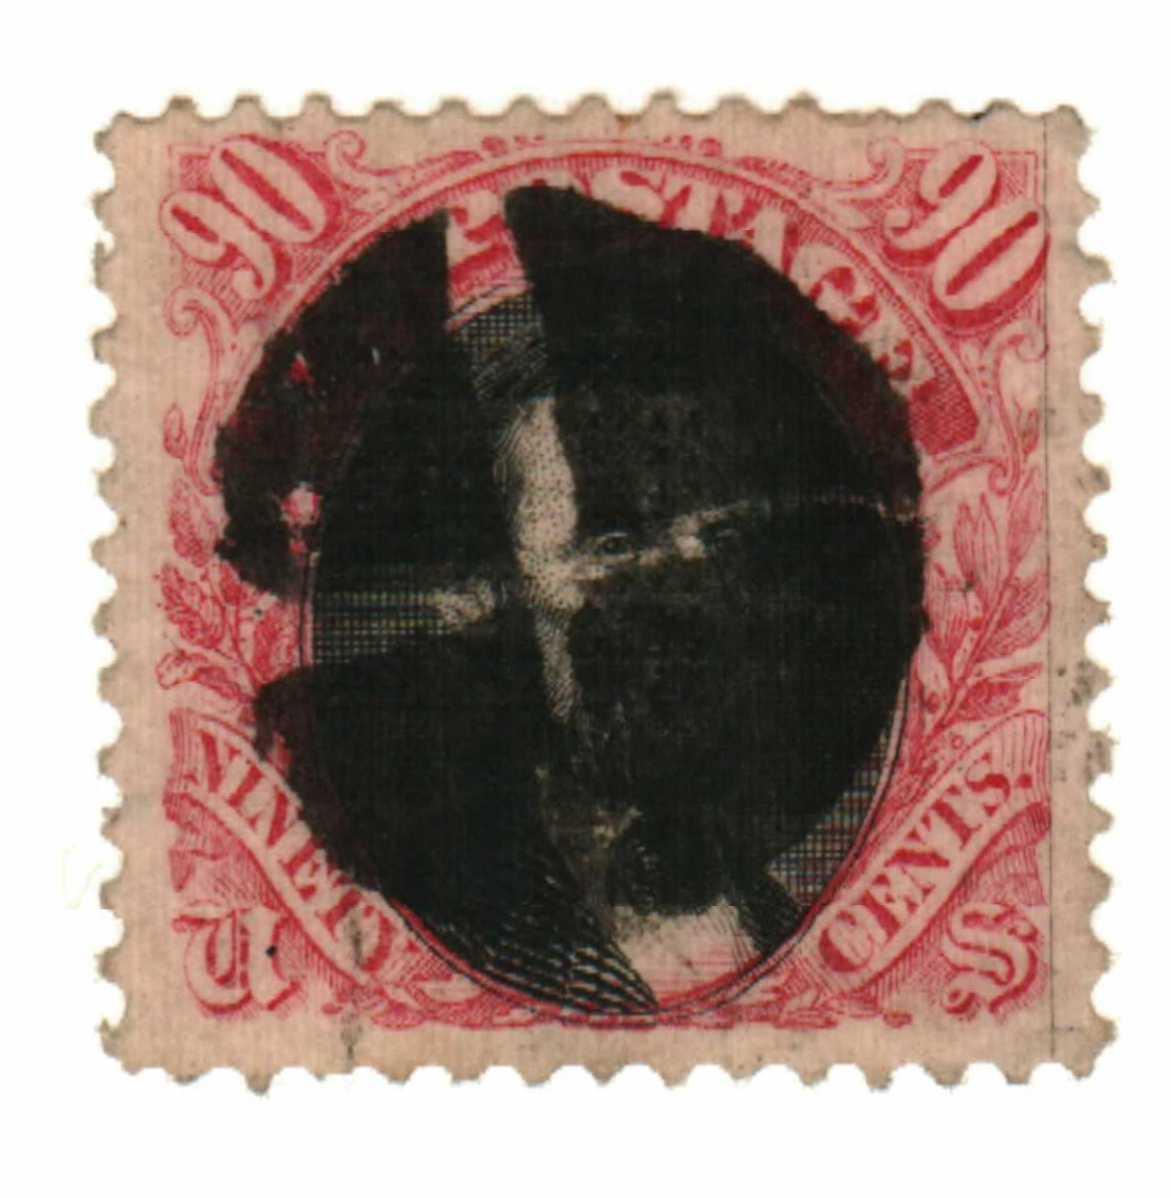 1869 90c Lincoln, carmine and black